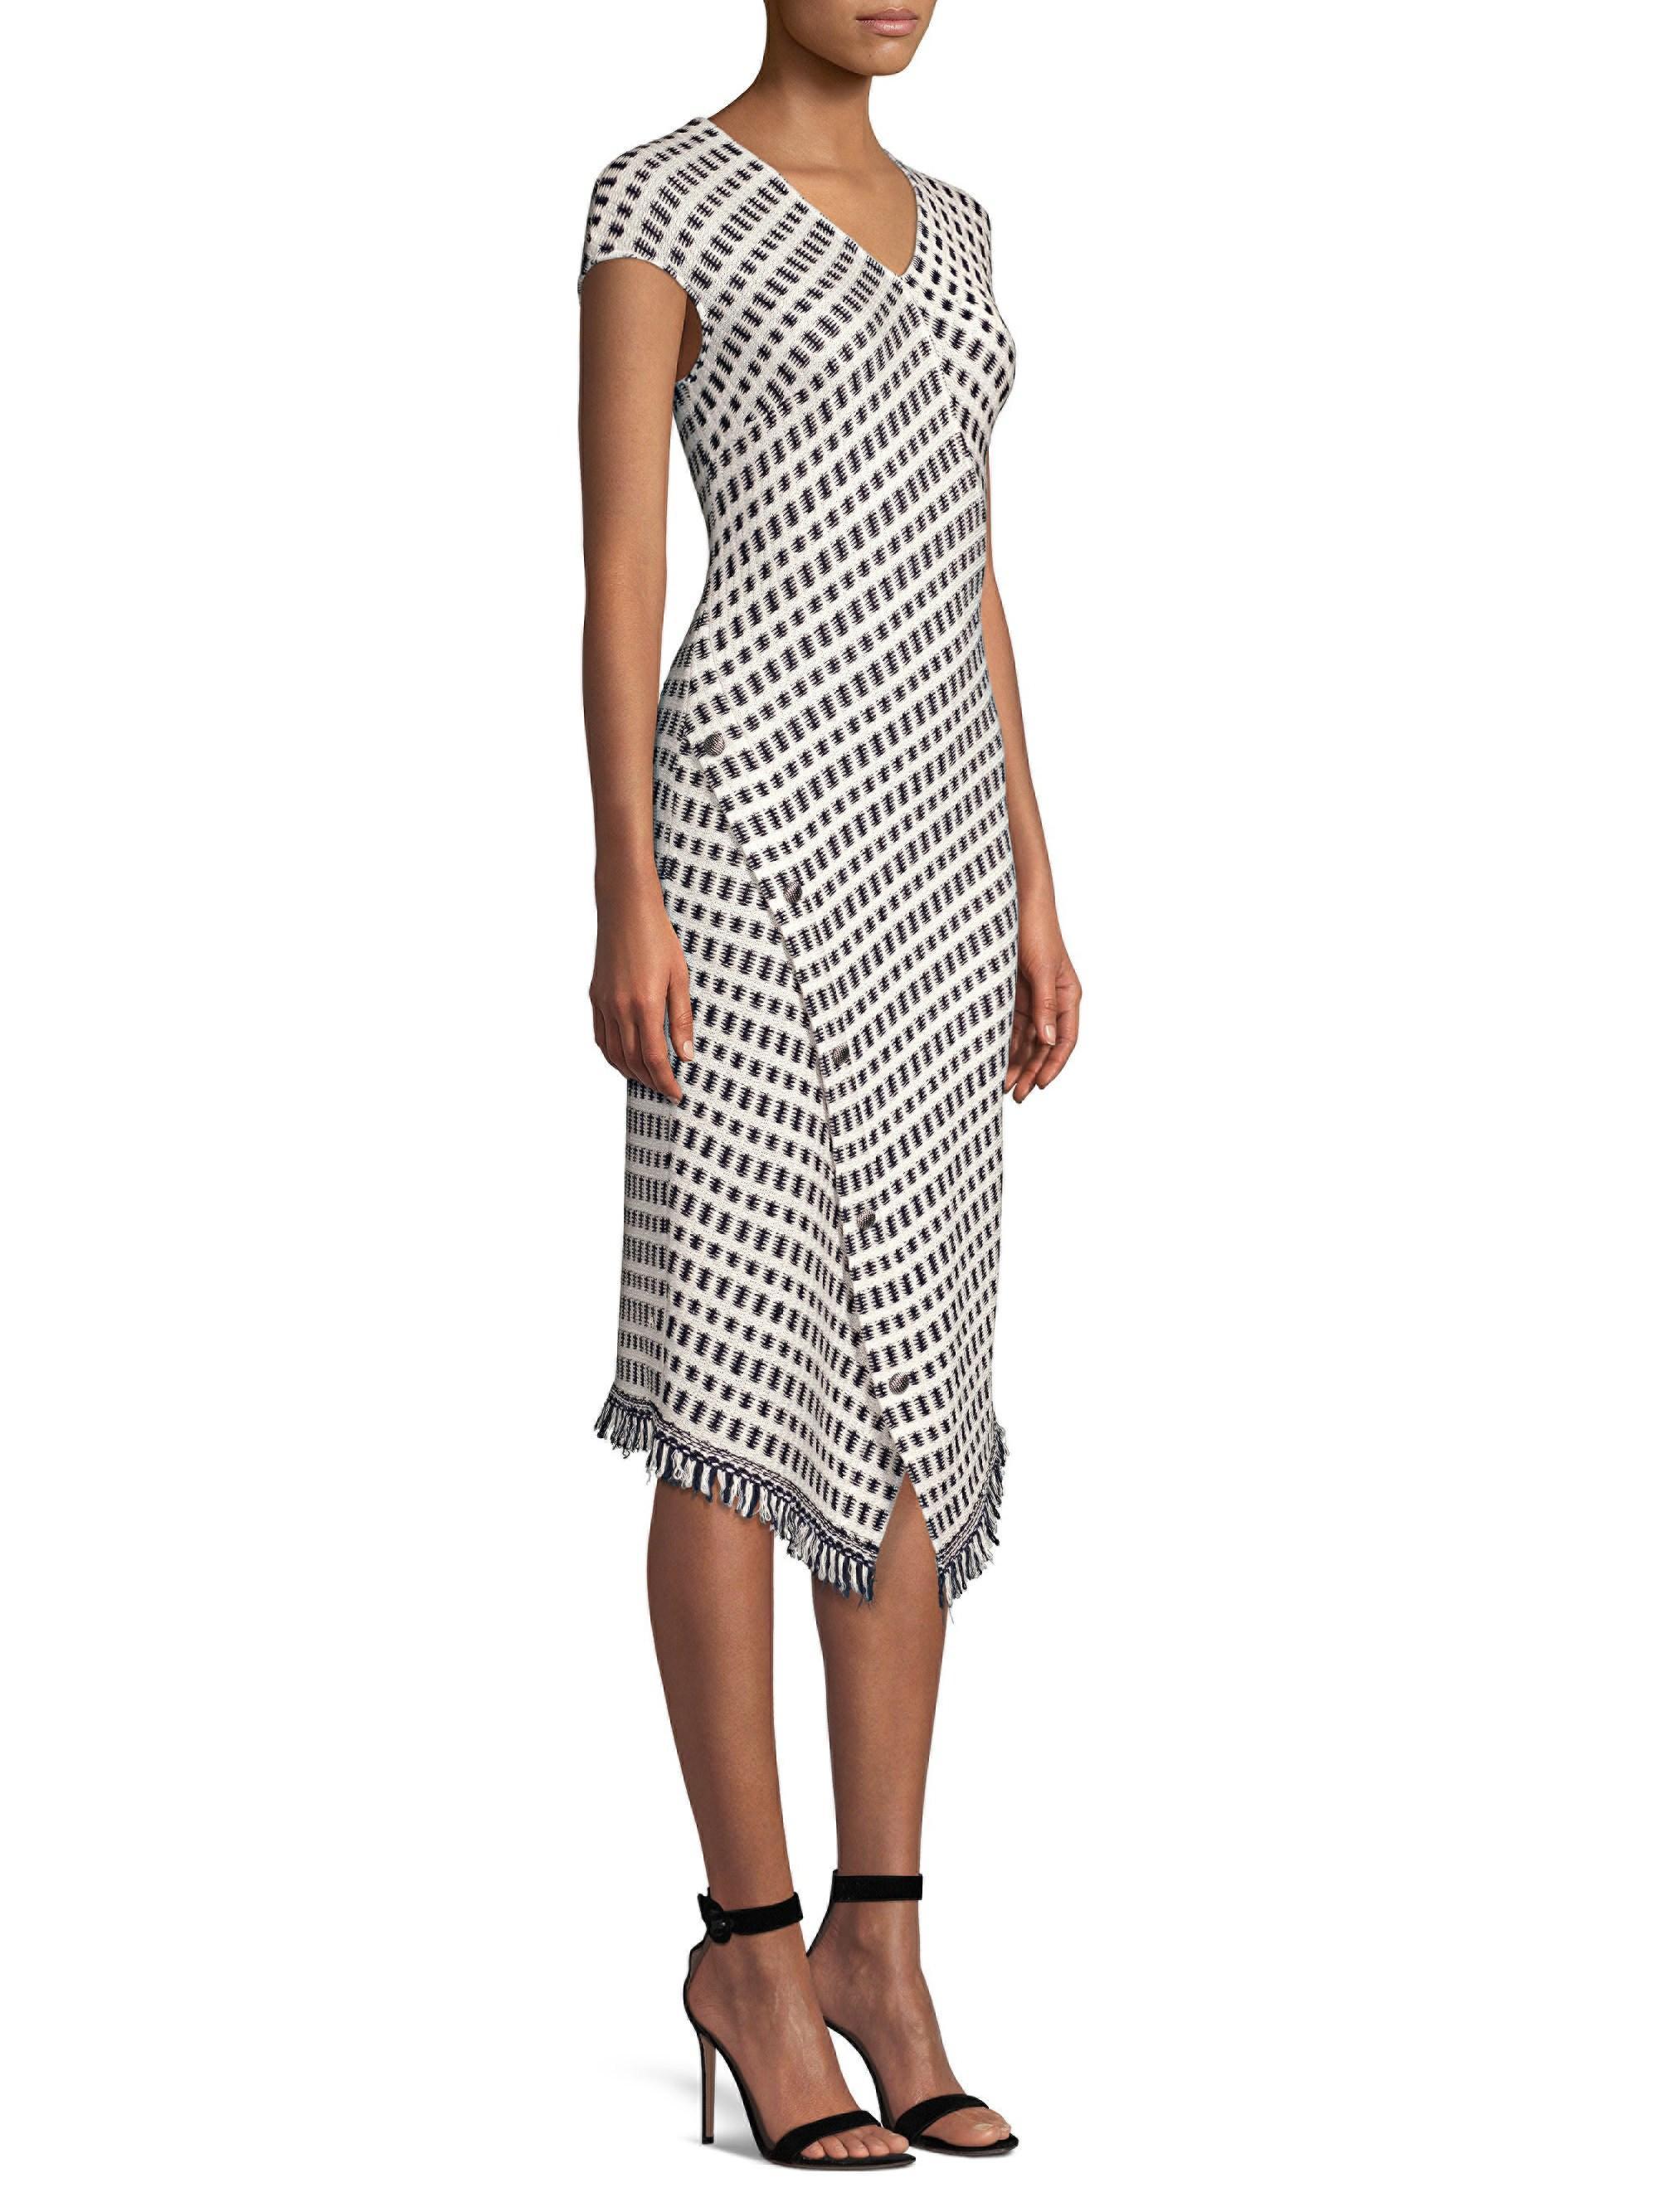 de00a6e0 St. John. Black Women's Jacquard Wrap-hem Dress - Size 4. $1,195 $478 From Saks  Fifth Avenue